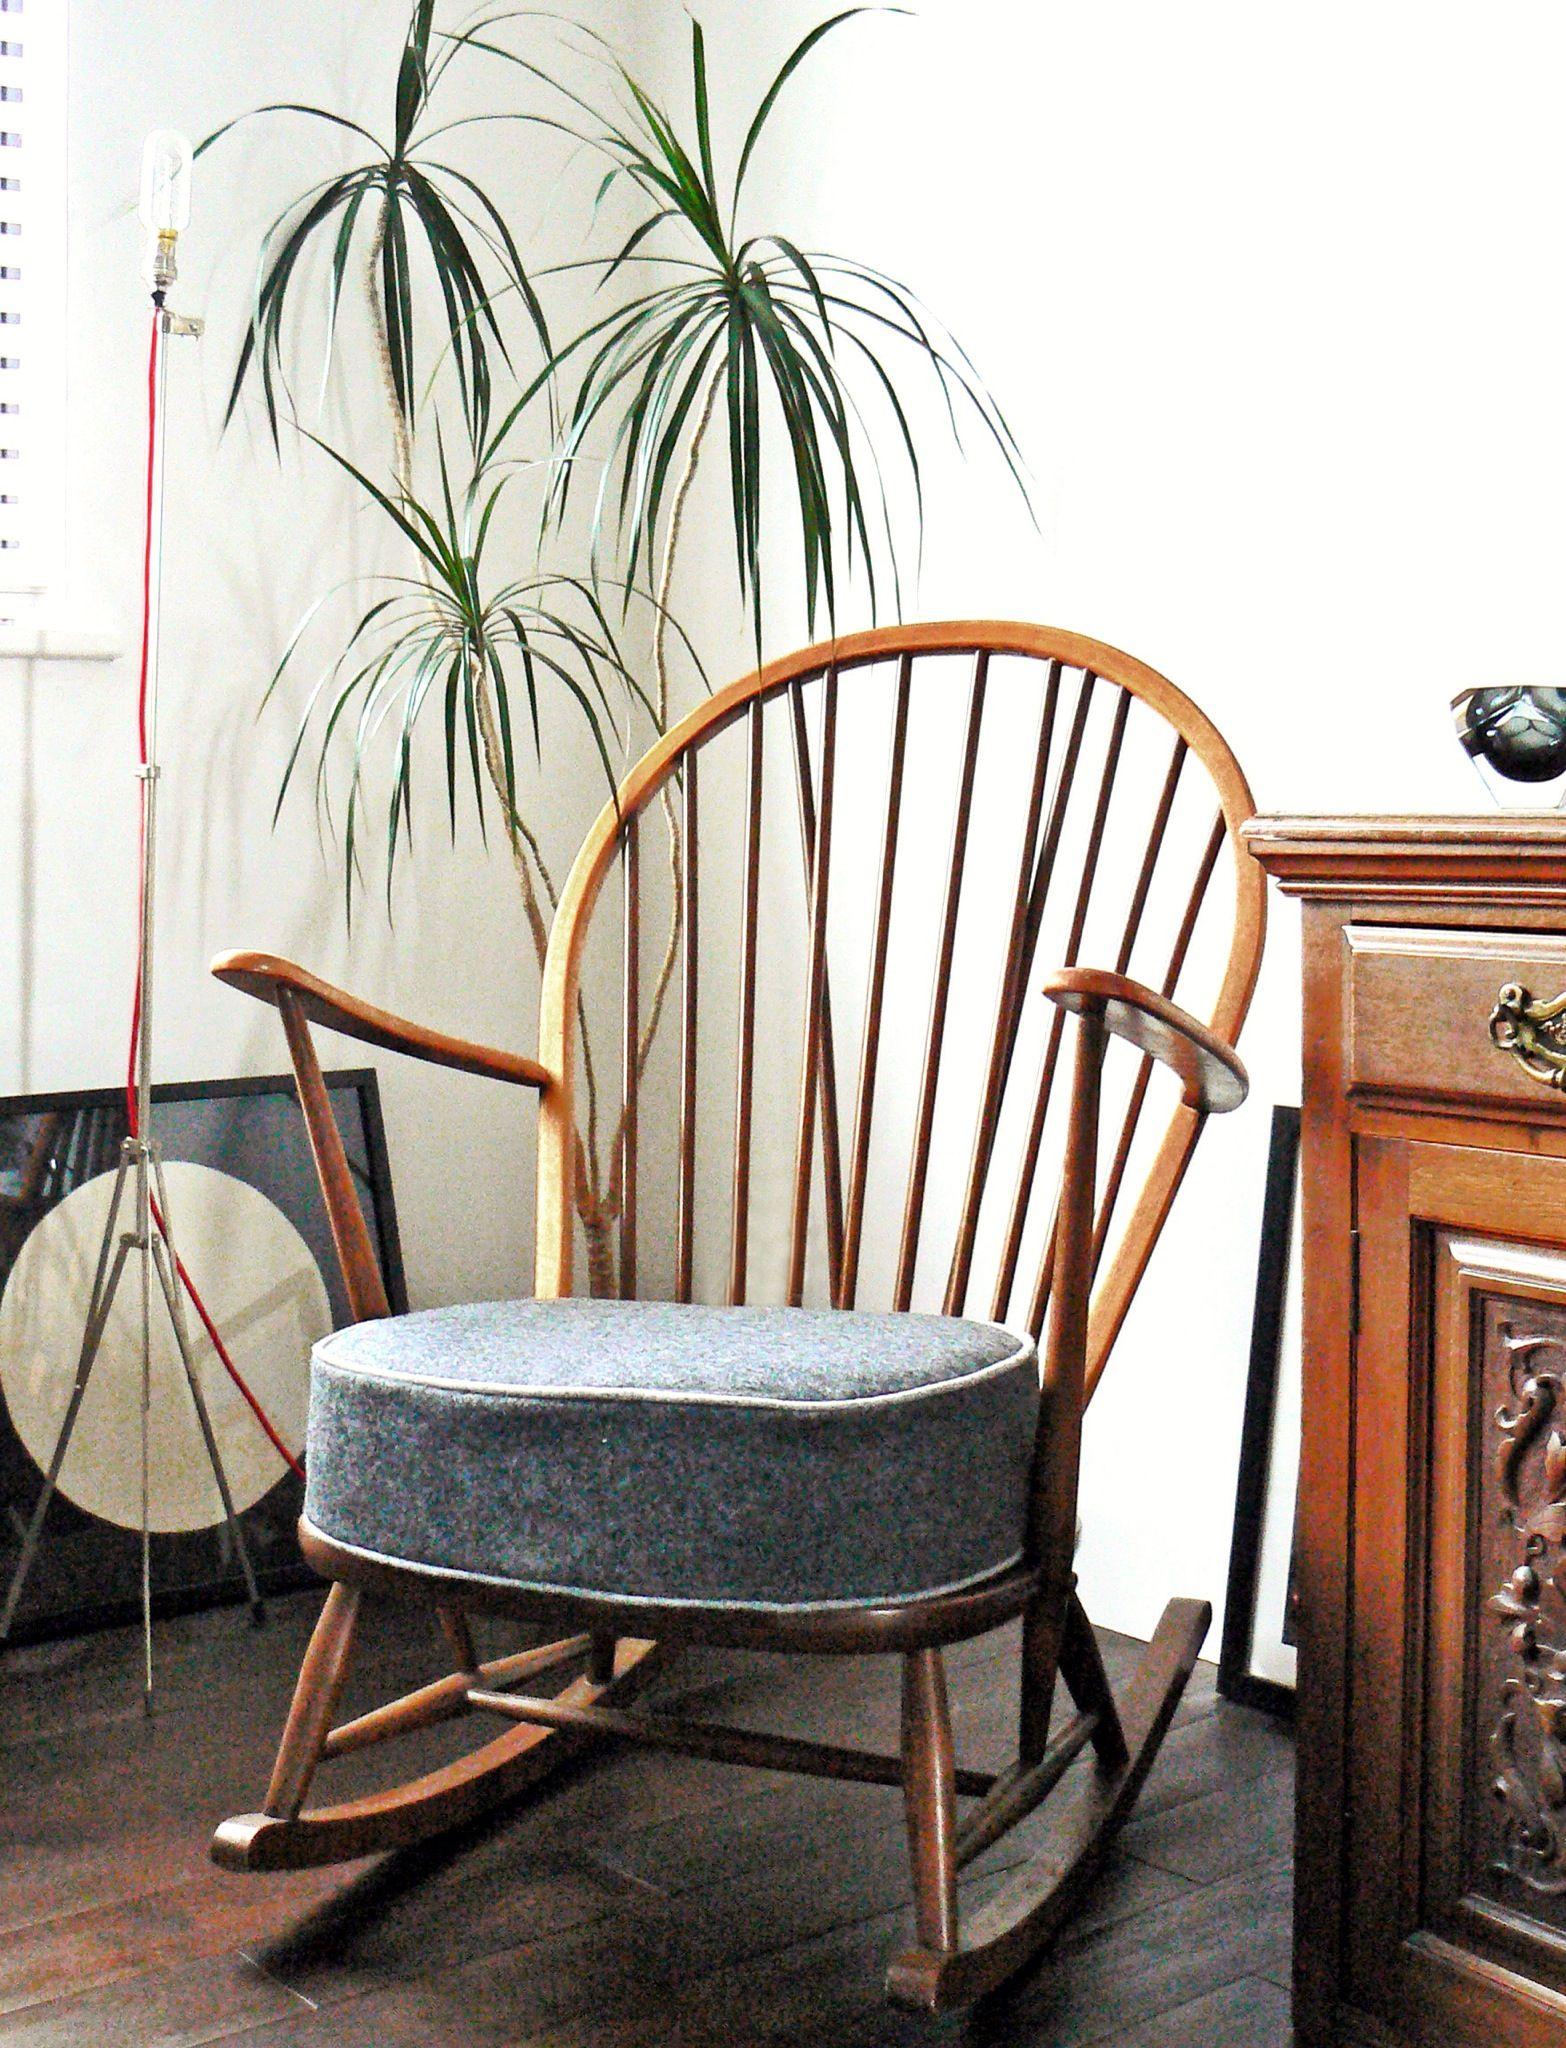 1960s Ercol Rocking Chair Ercol Rocking Chair Rocking